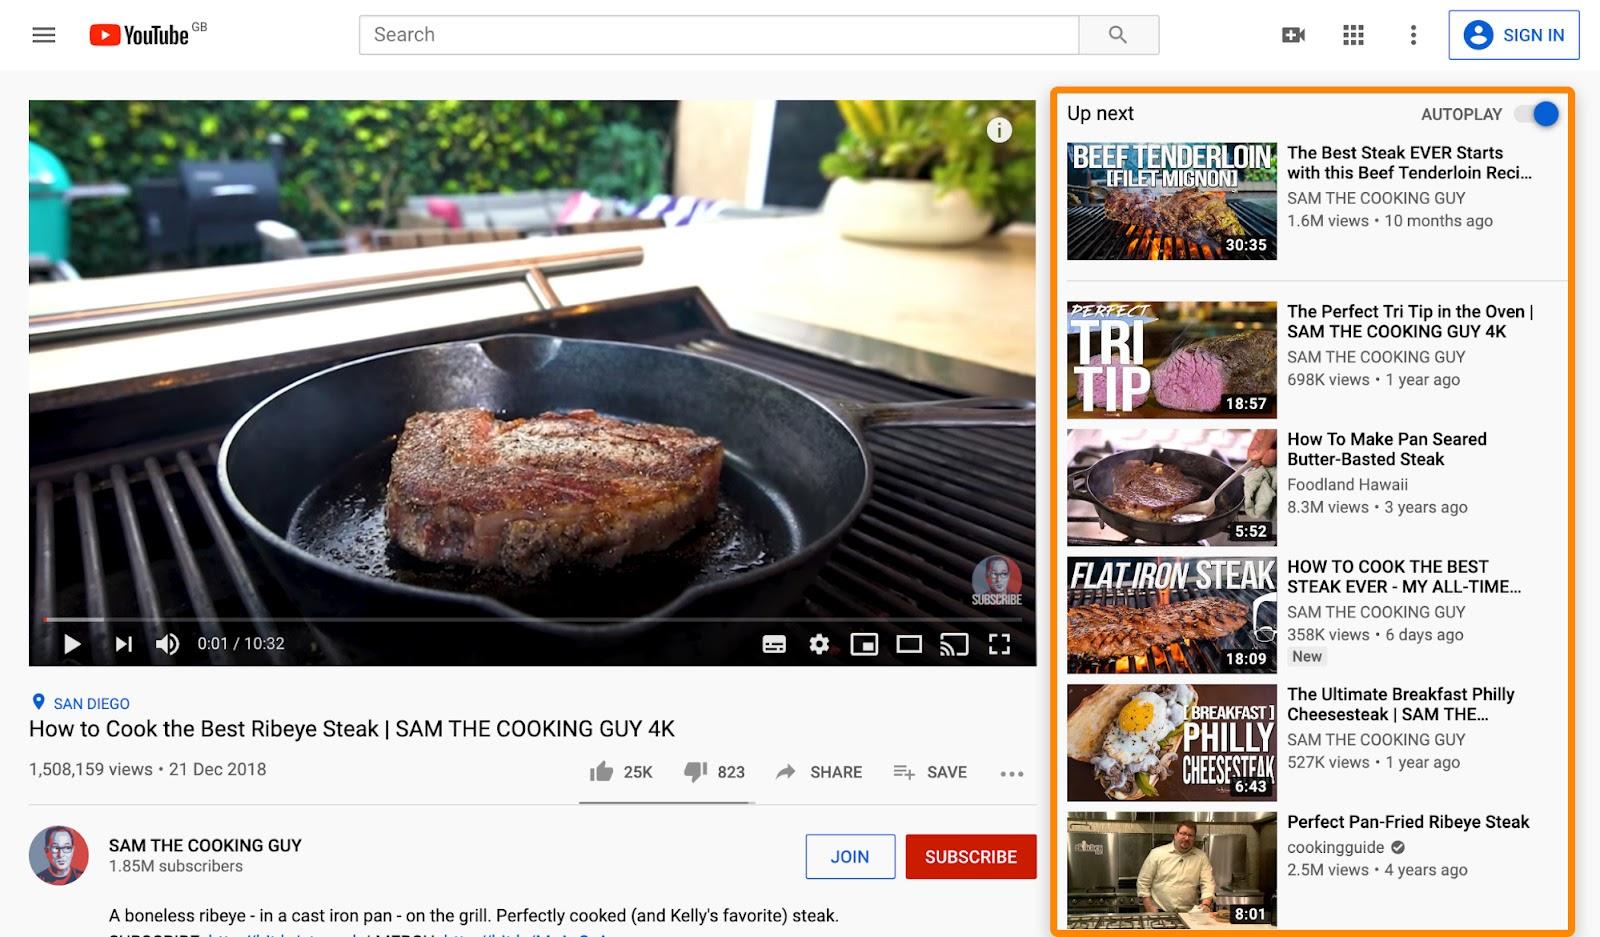 2 youtube steak recipes